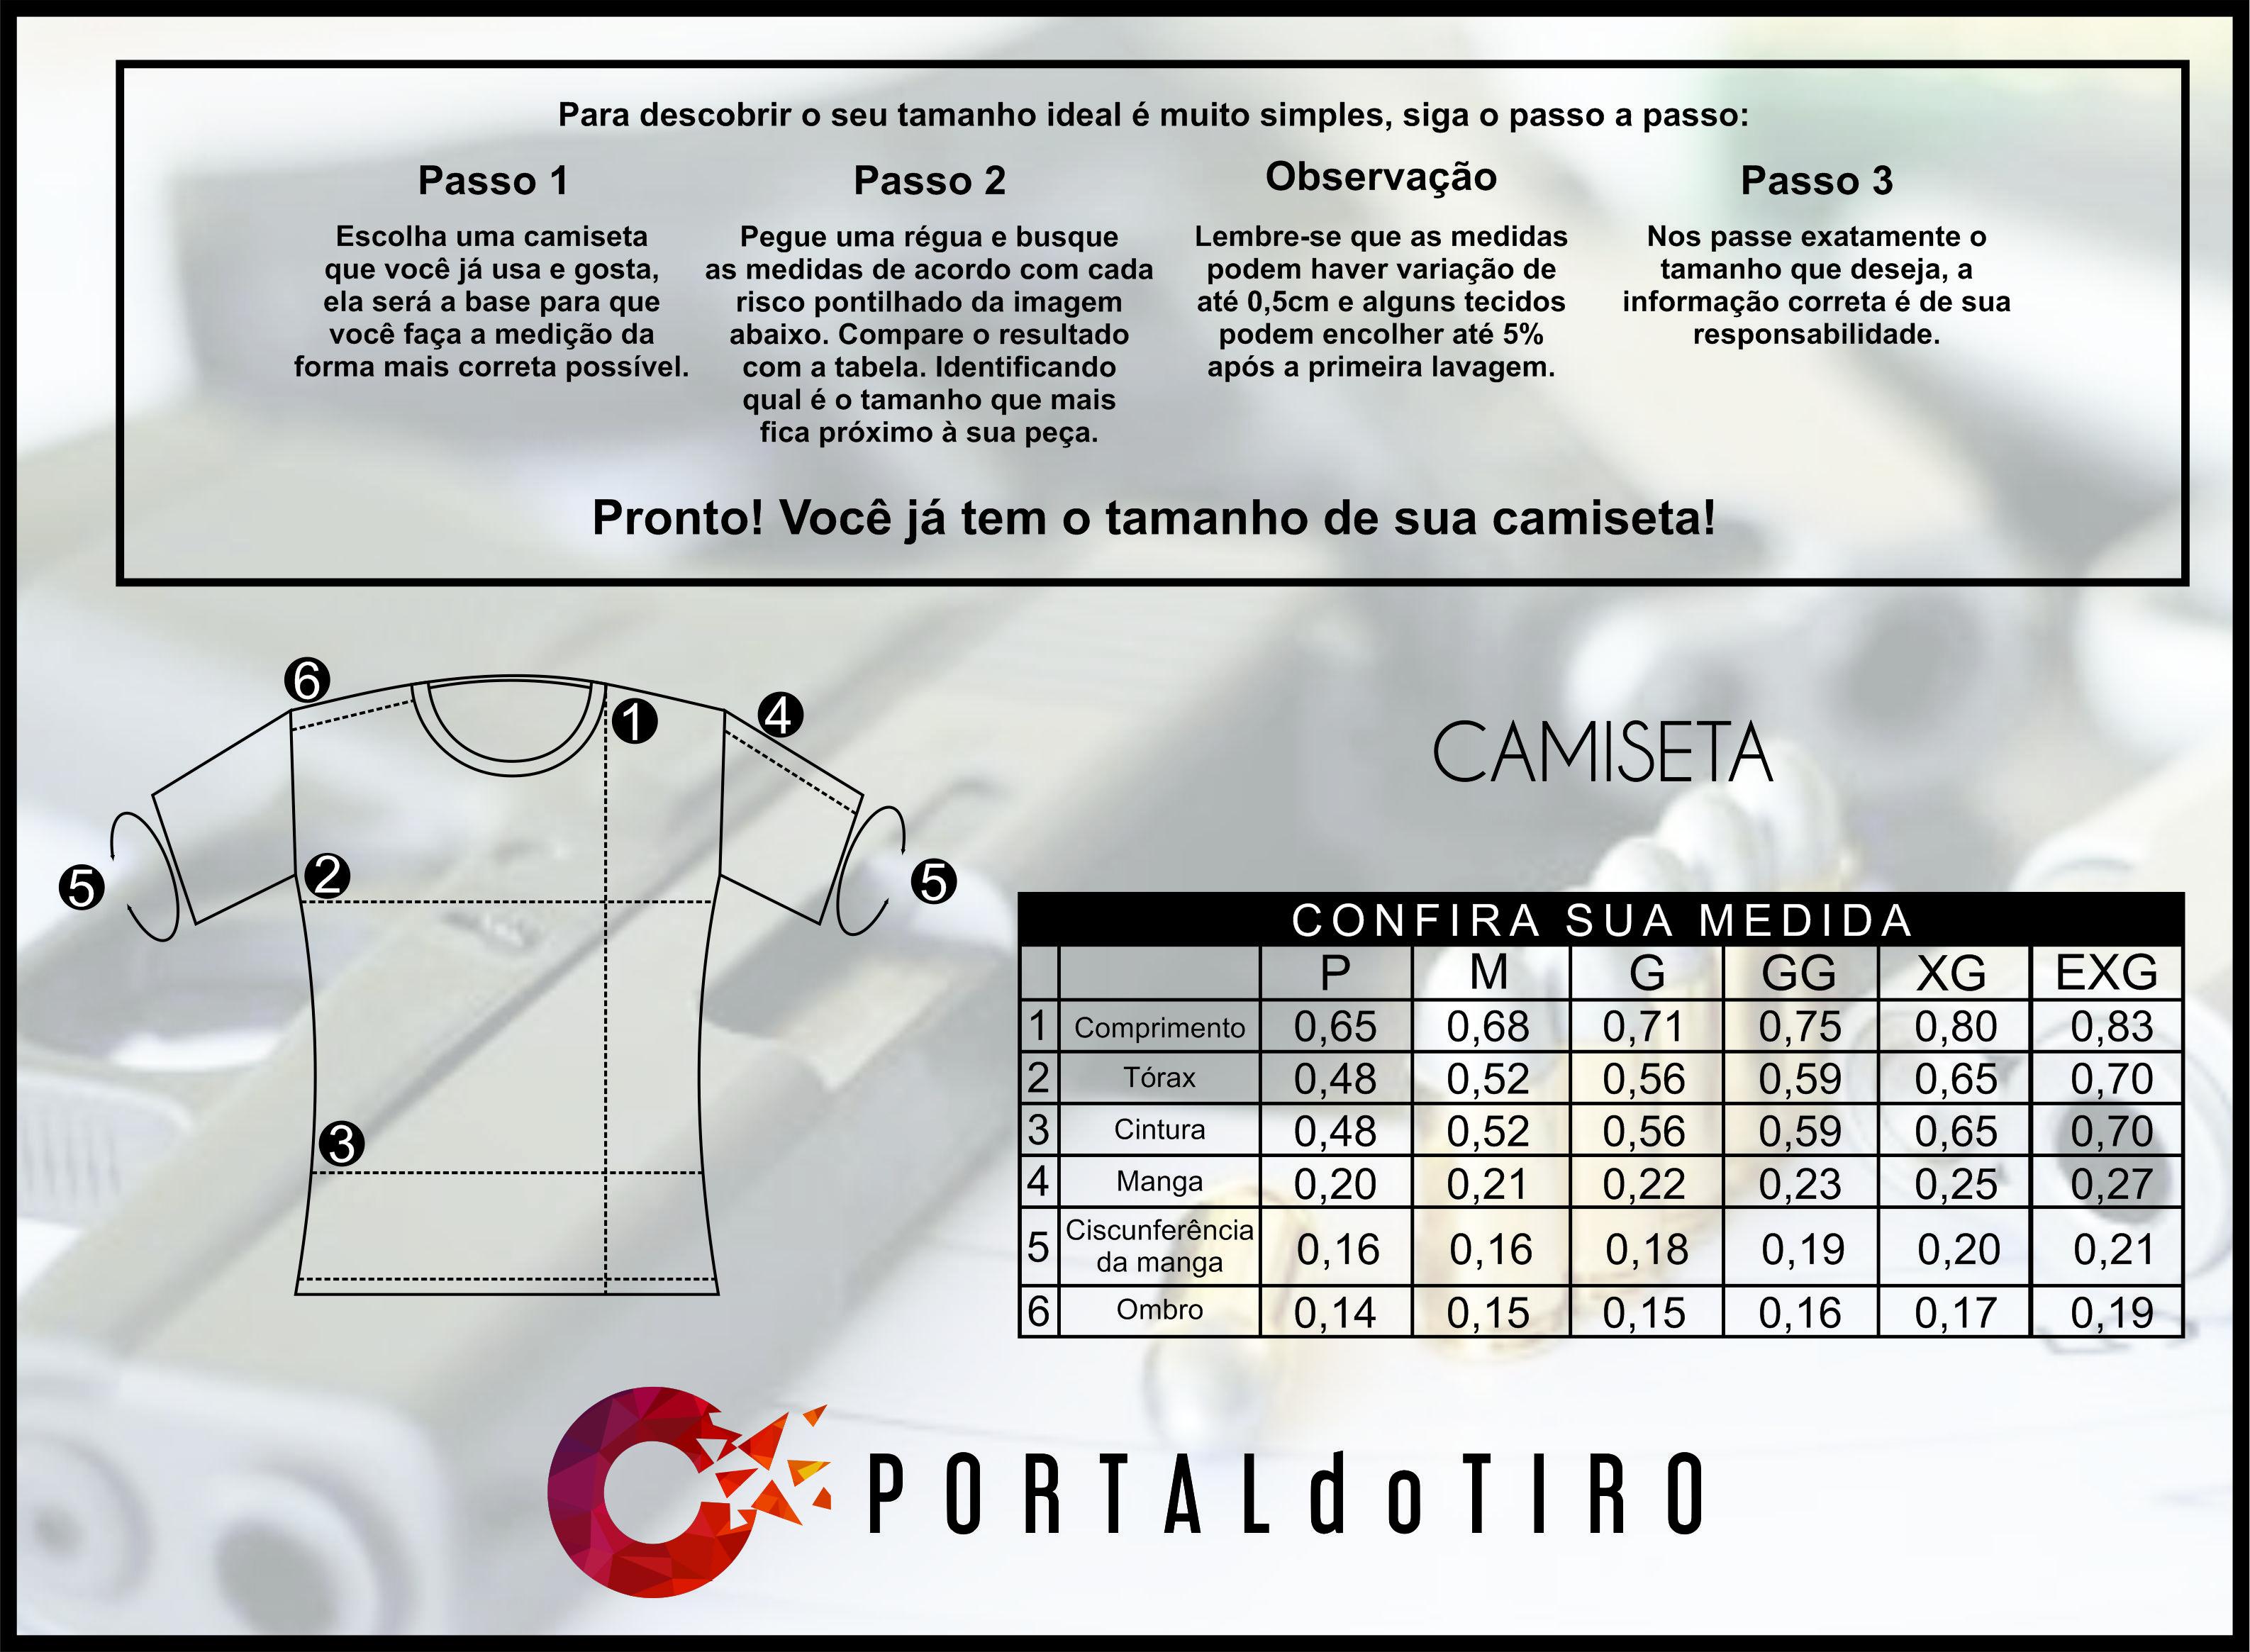 Camiseta Tabela Portal do Tiro 2021.jpg